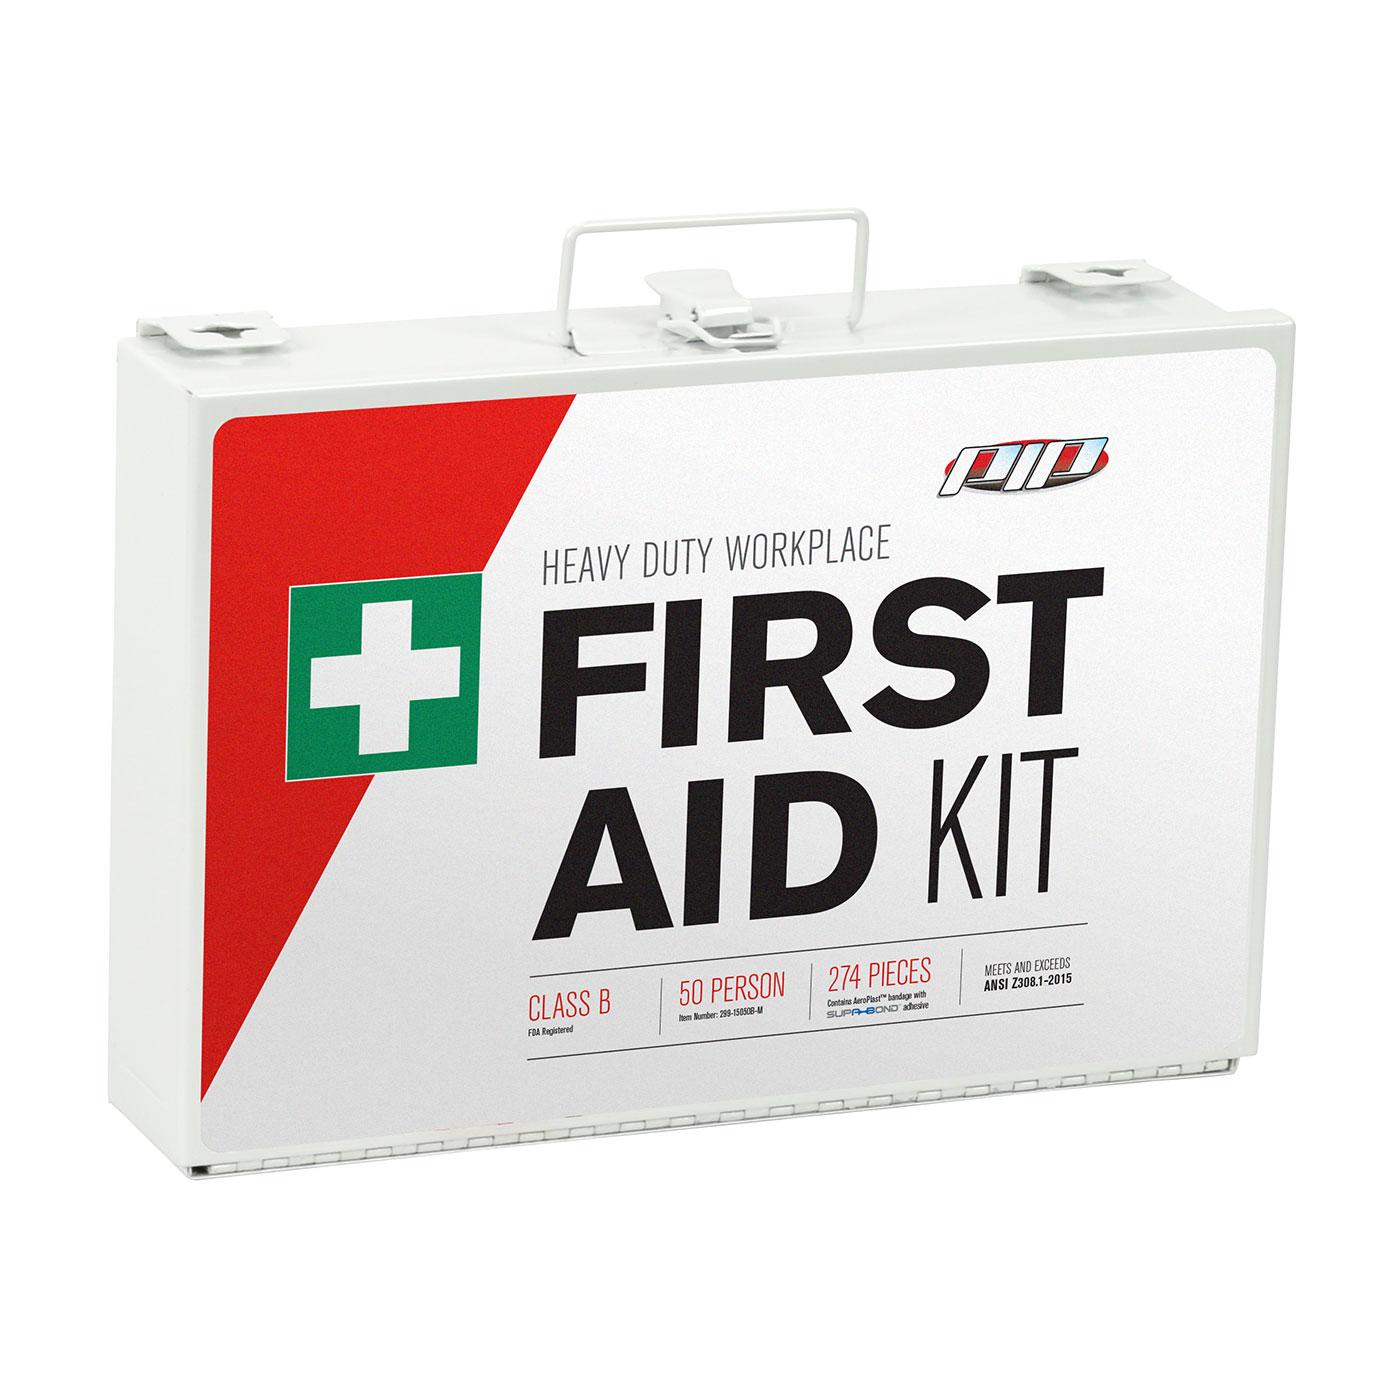 ANSI Class B Metal First Aid Kit - 50 Person, White, KIT